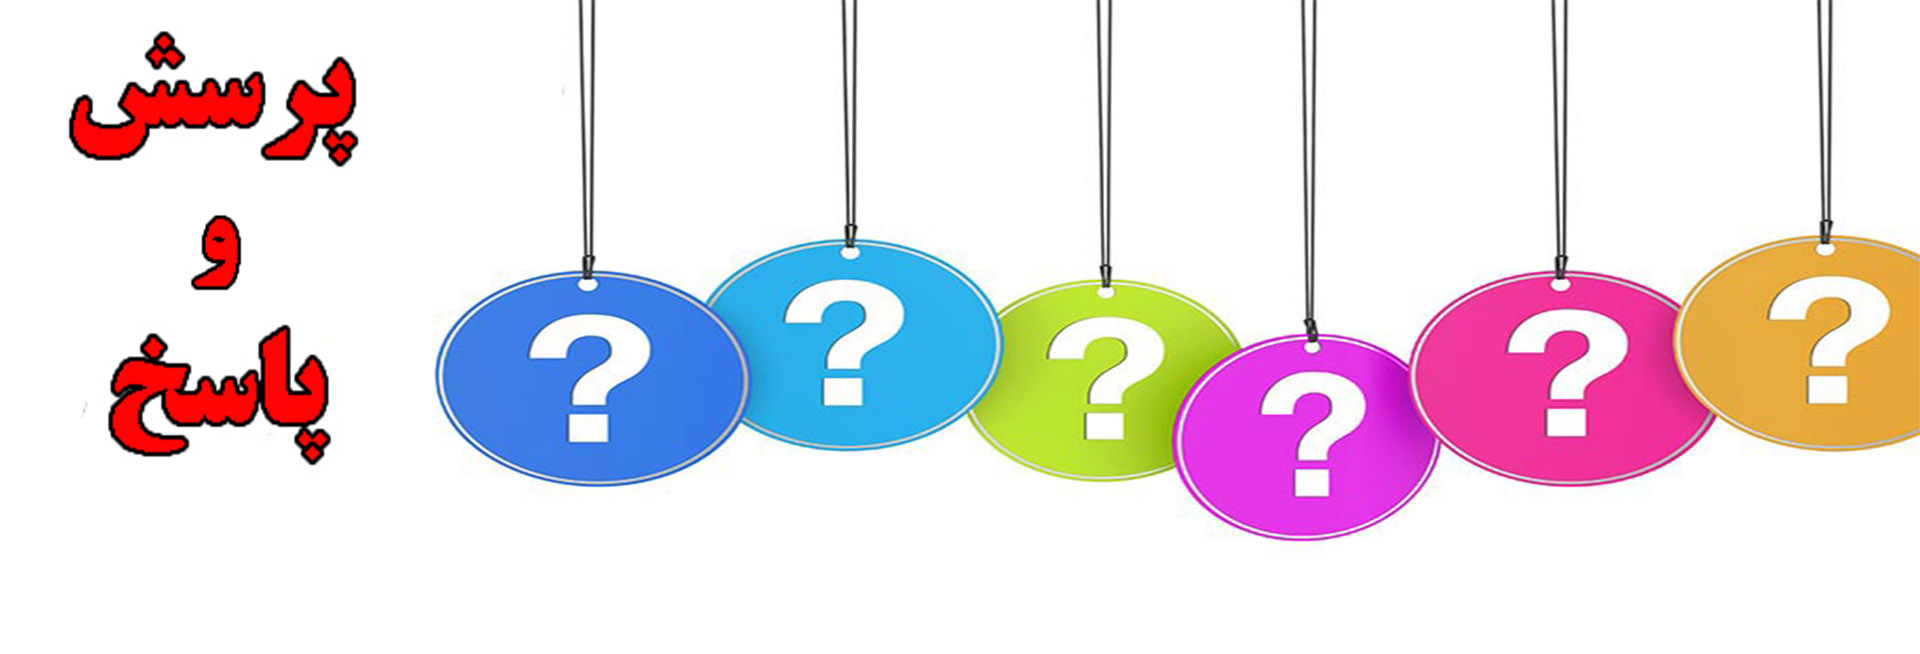 پرسش و پاسخ پزشکی,سوالات رایج دندانپزشکی،سوالات رایج پوست و مو،سوالات رایج روانشناسی